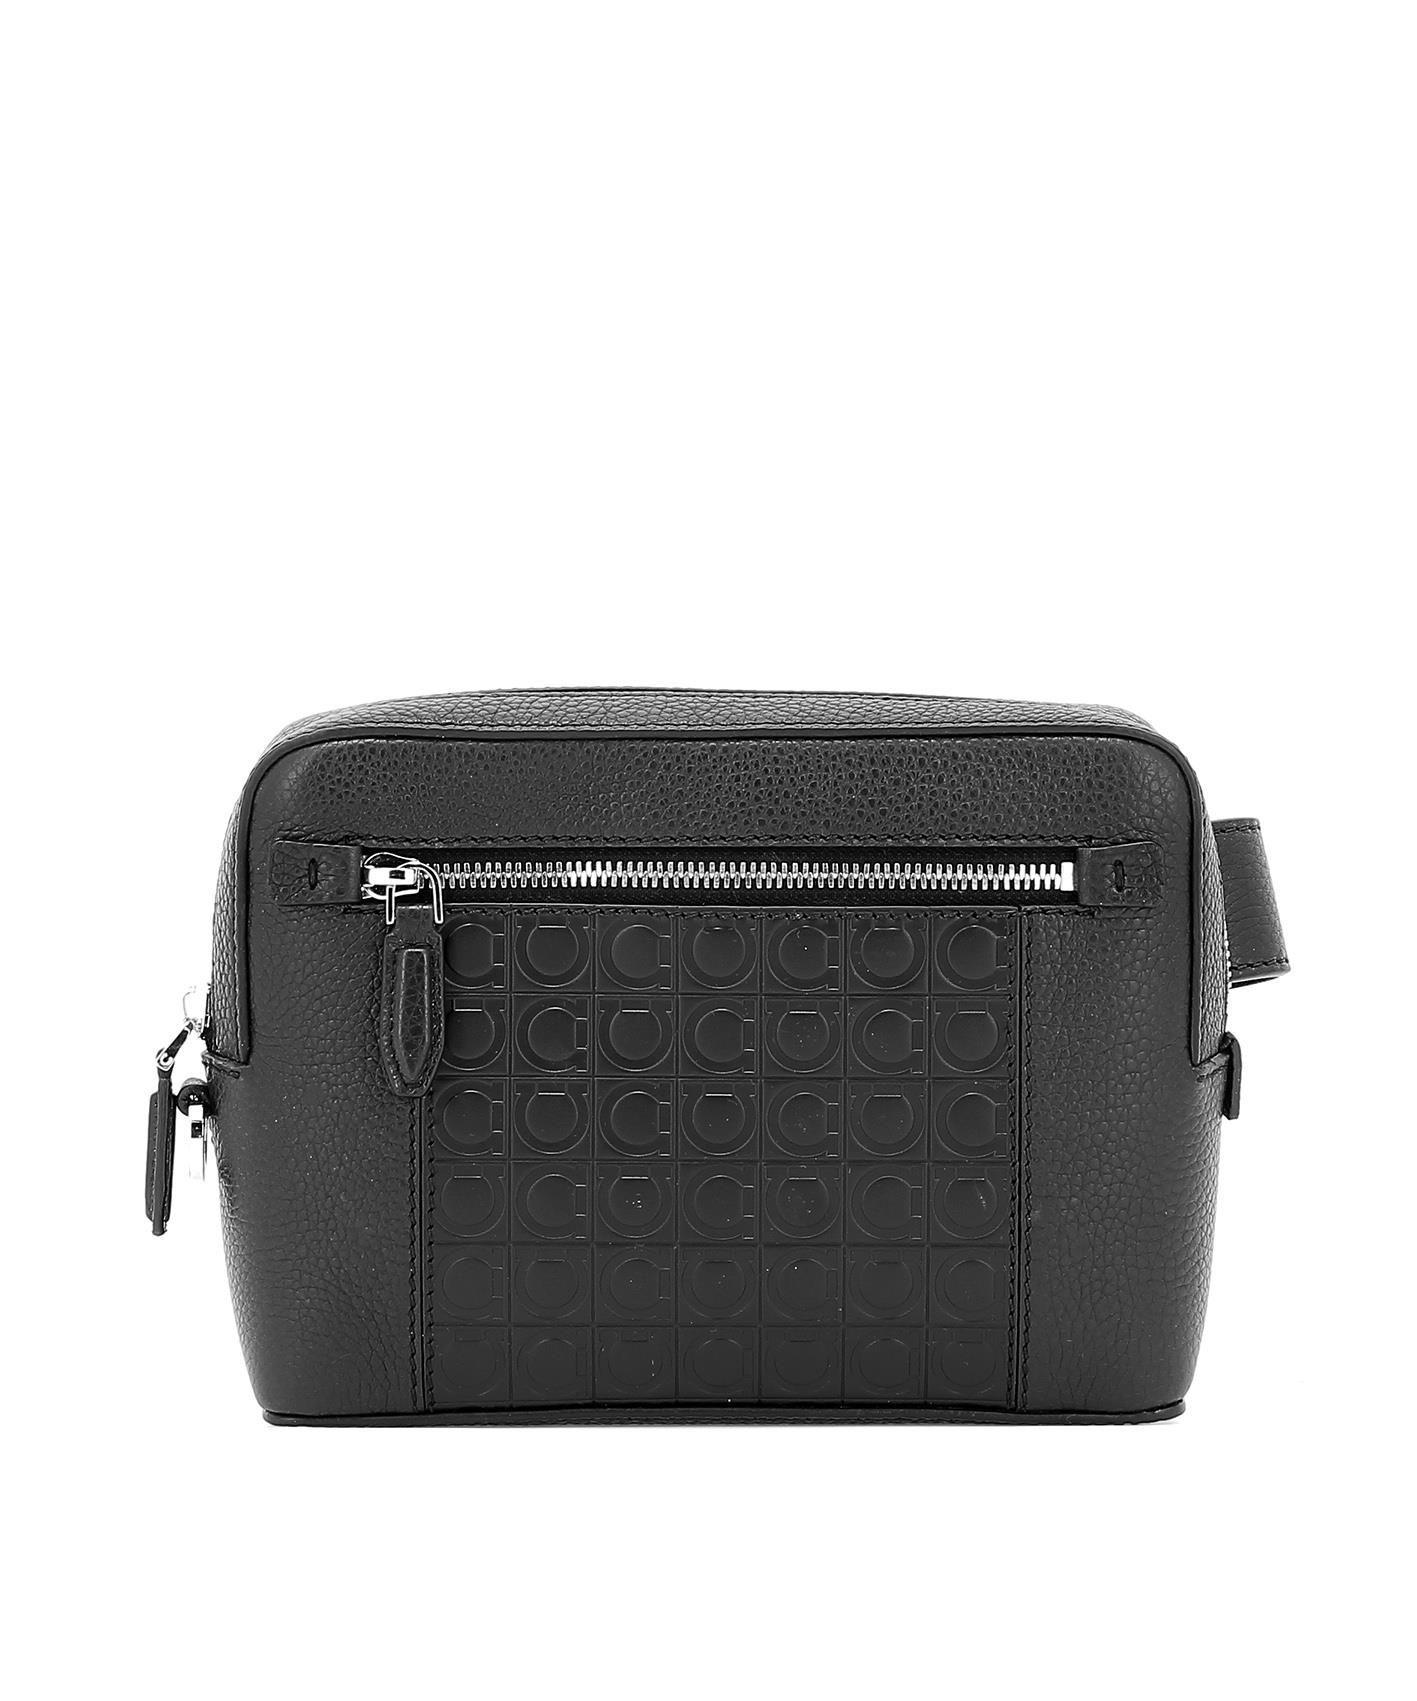 Lyst - Ferragamo Men s Black Leather Travel Bag in Black for Men c9ea2f96be2a8